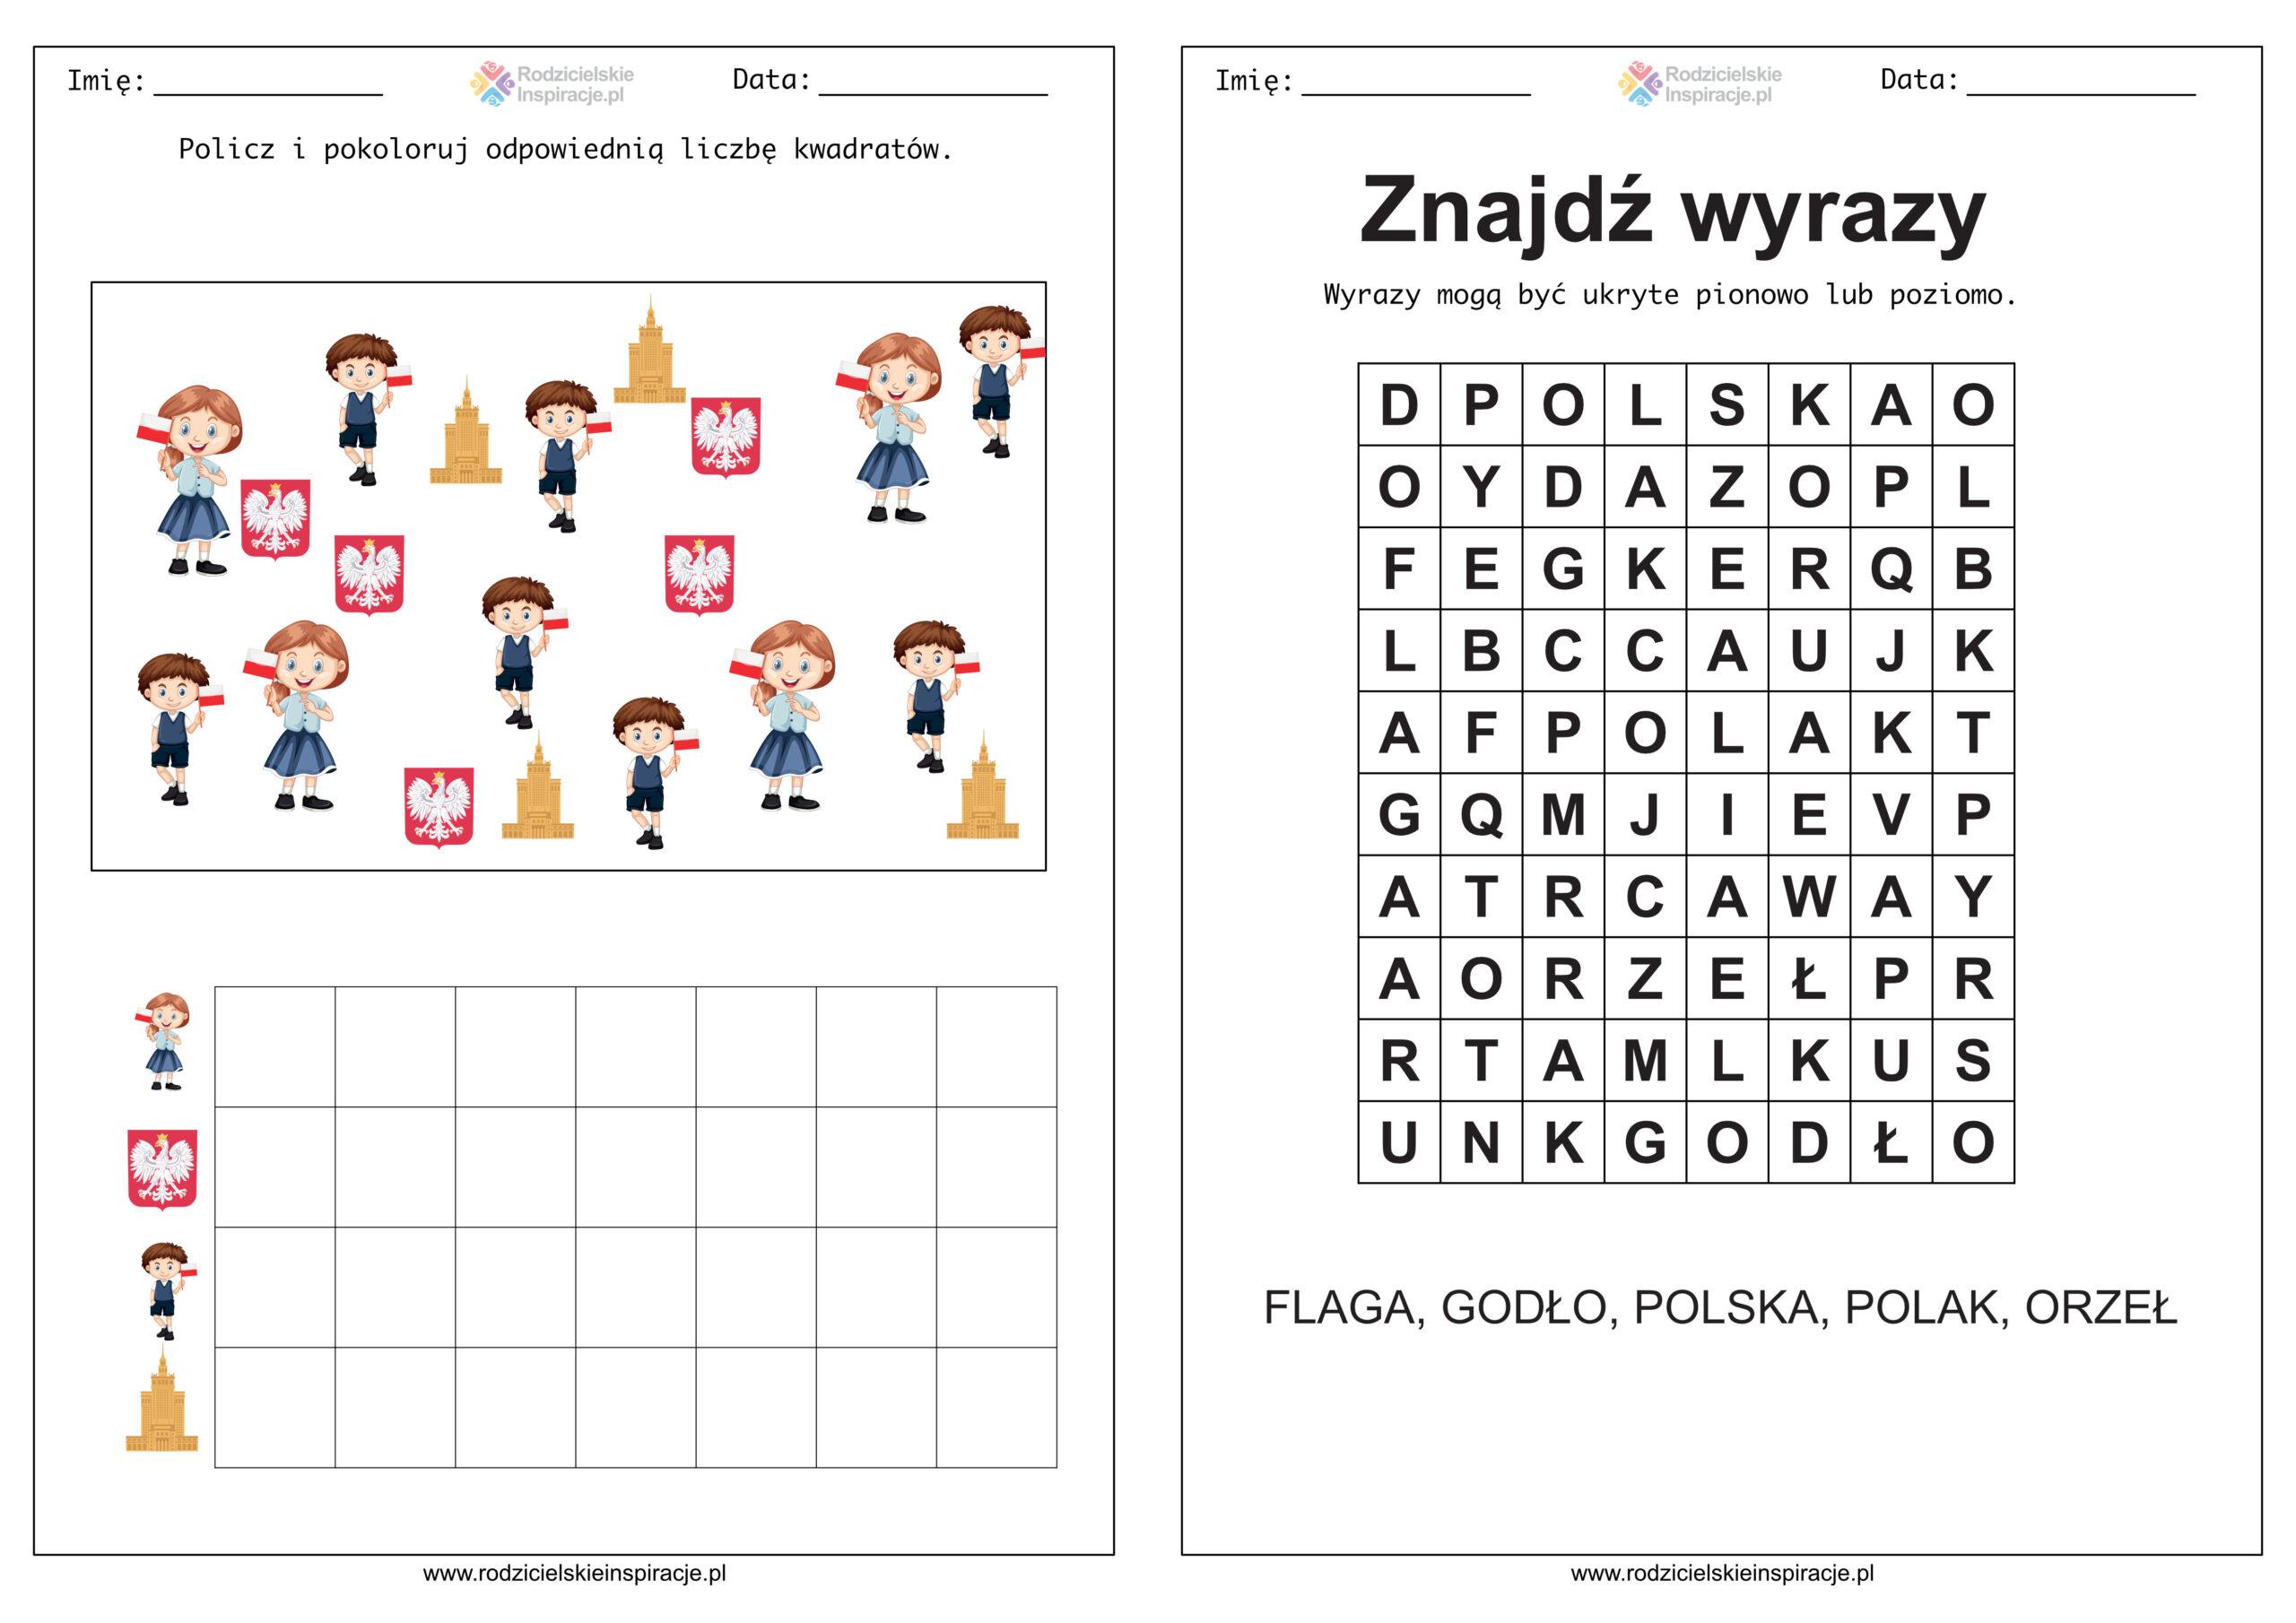 POLSKA-PUBL